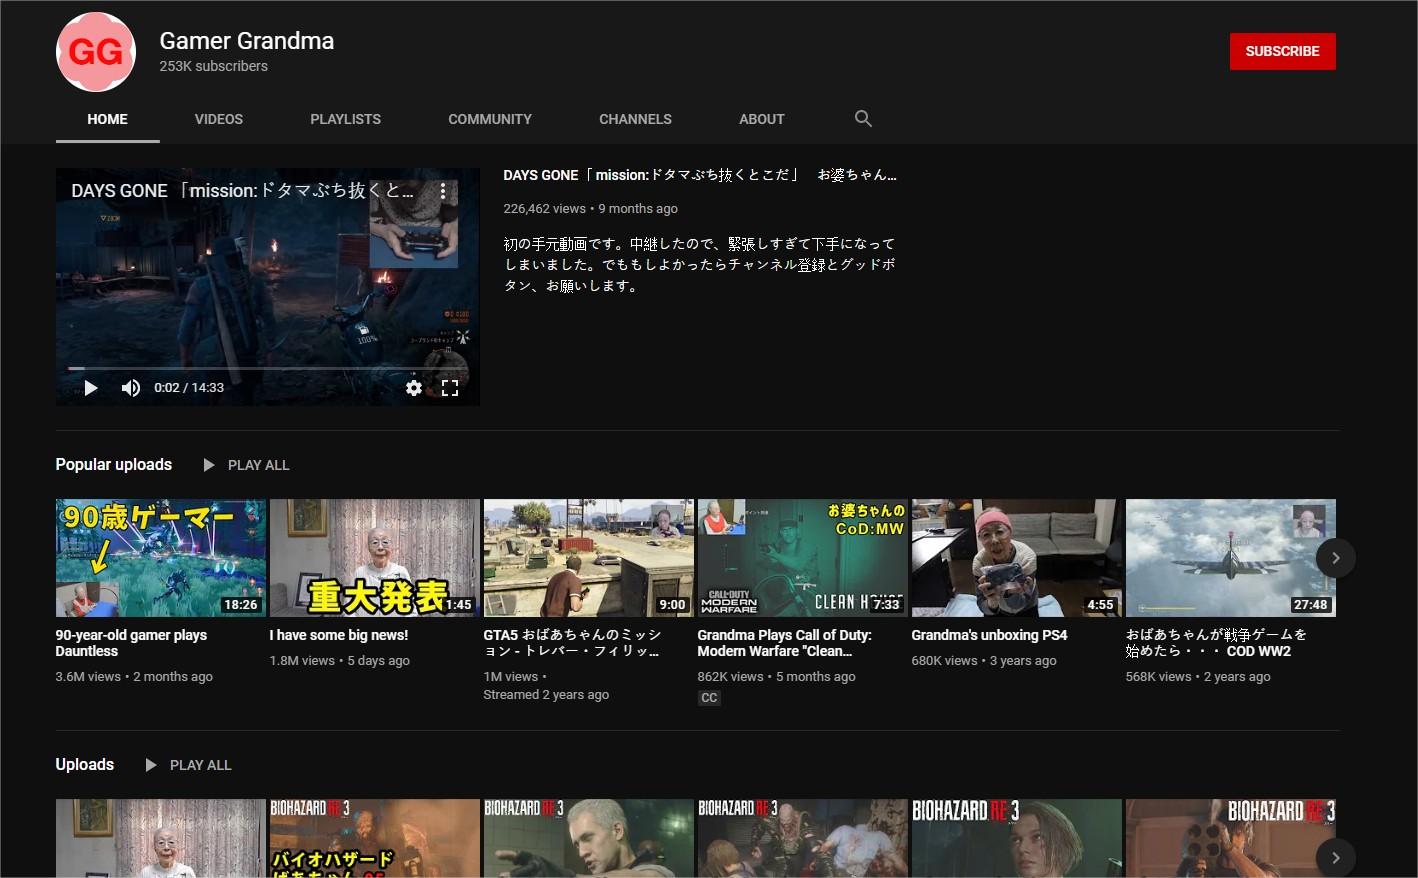 Hamako Mori, Nenek Gamer yang Mendapat Guinness World Records